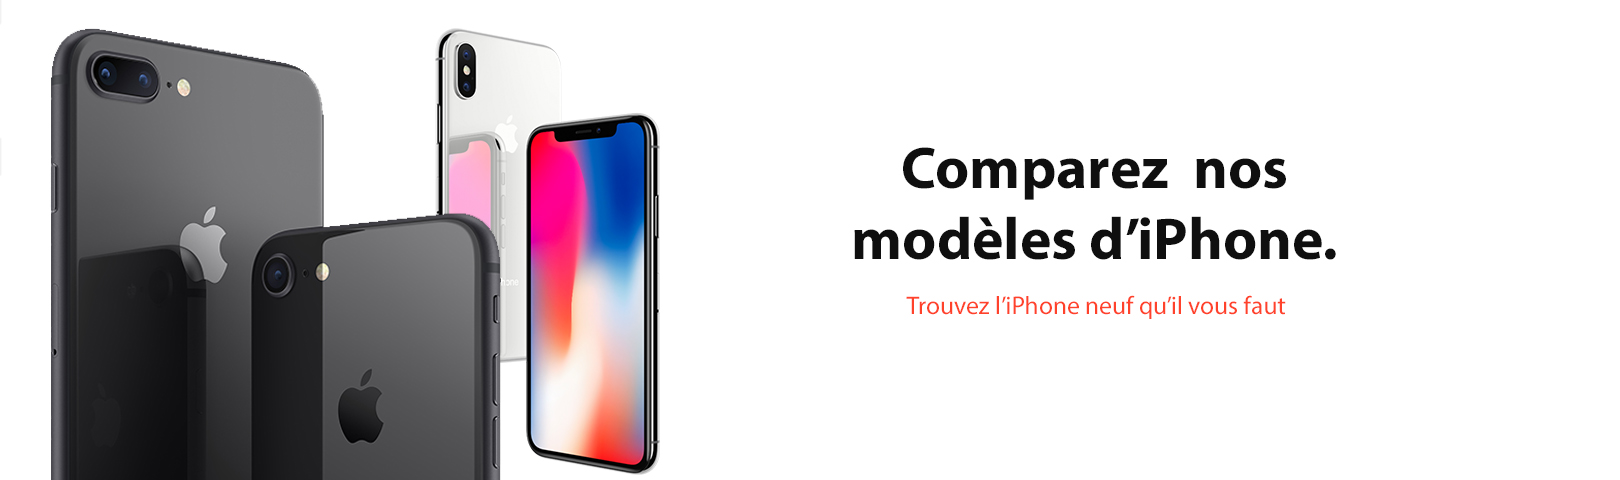 smartphone iphone neuf 6 7 8 9 X S R apple 64 128 ynotek france